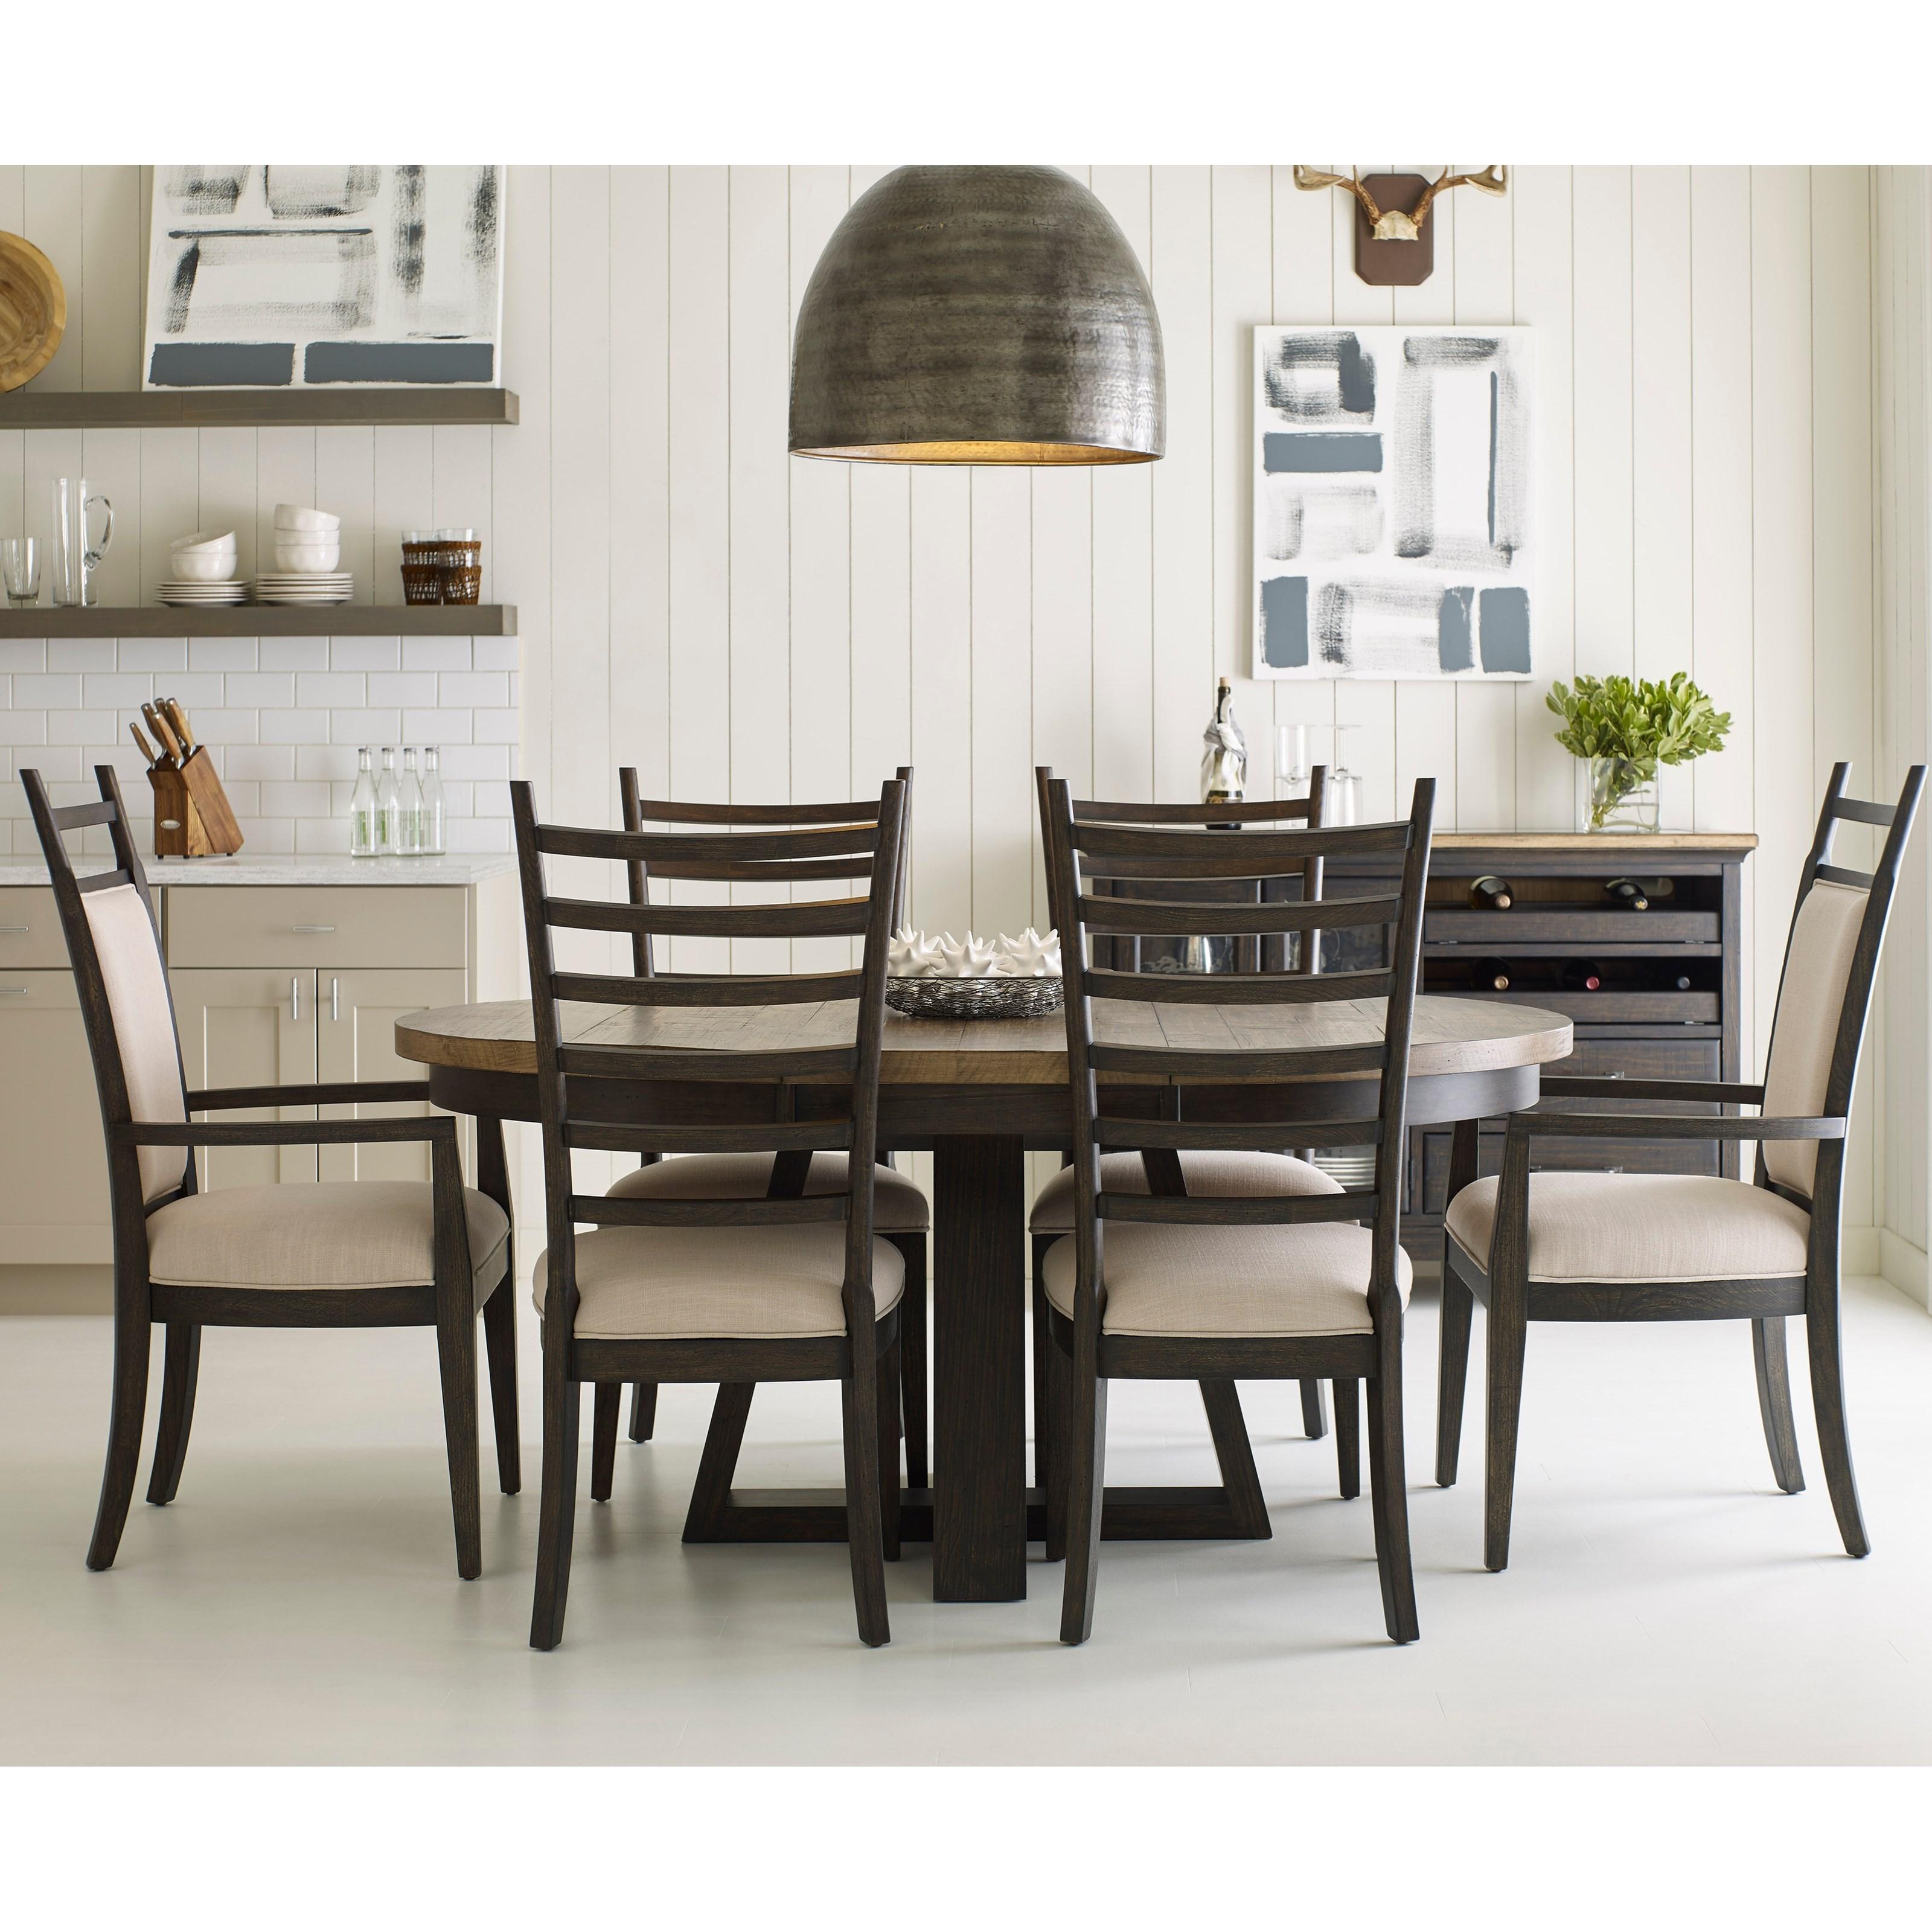 Kincaid Furniture Plank Road7 Pc Dining Set ...